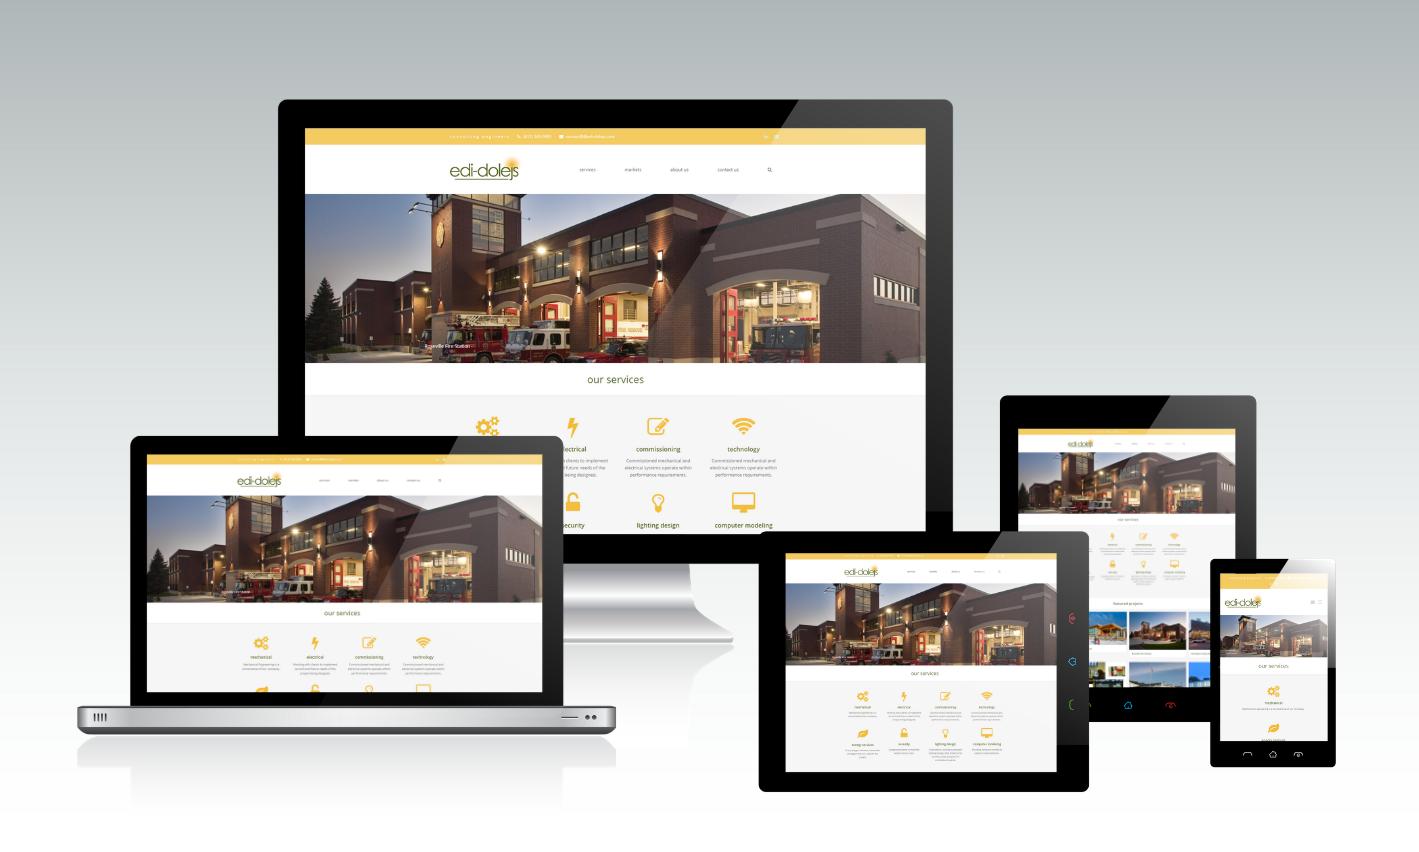 edi-dolejs Responsive Website Design